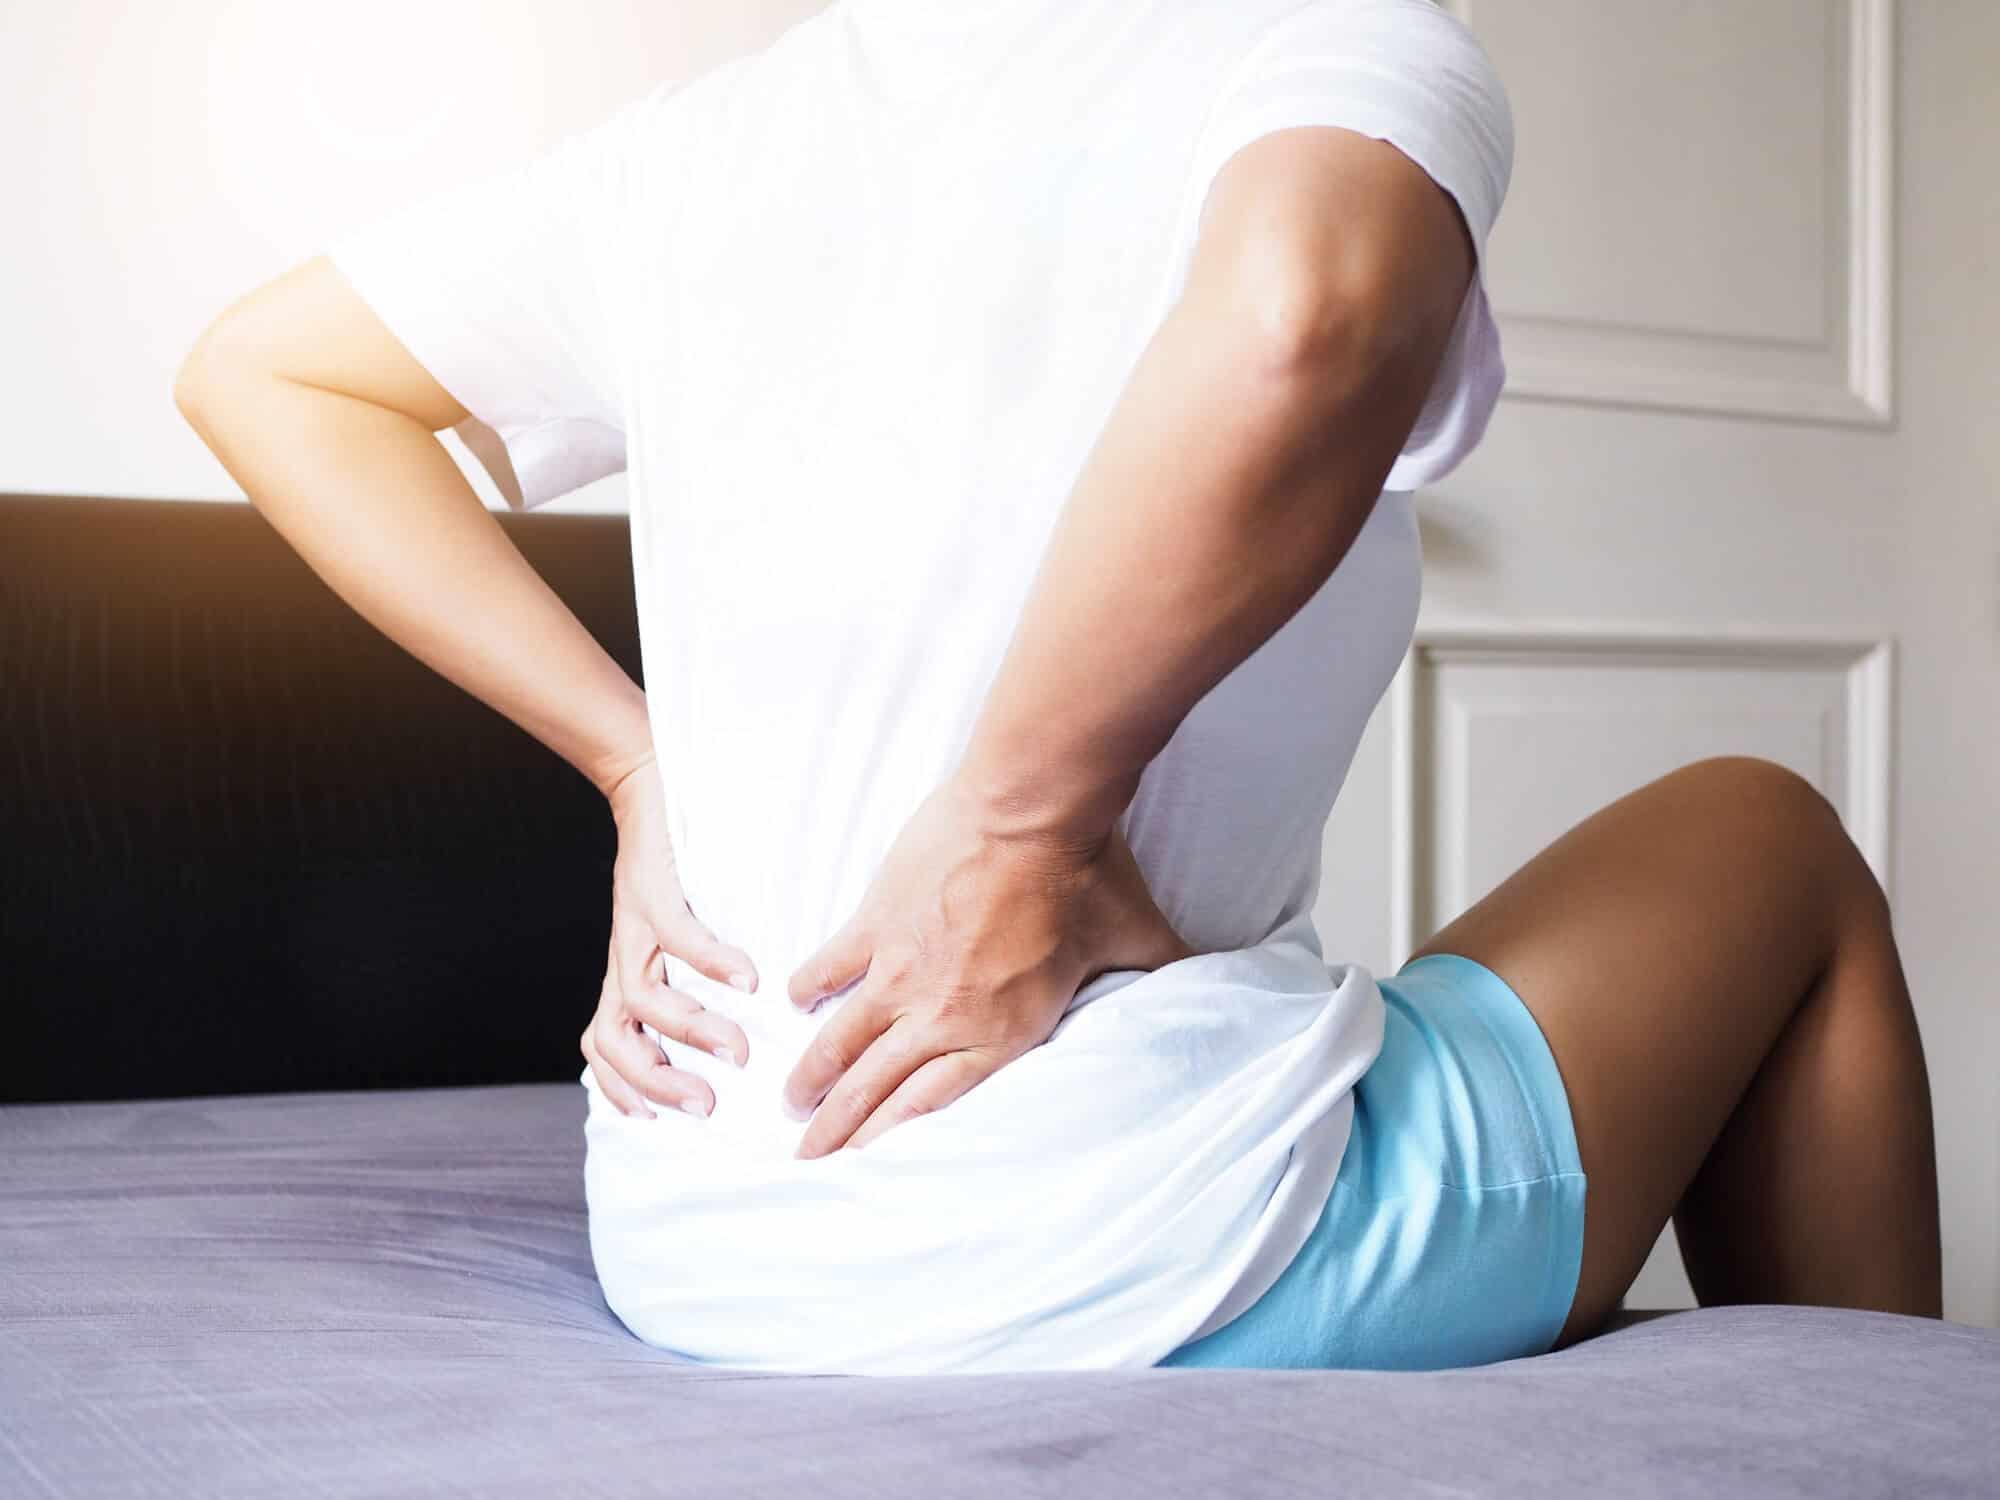 self massage technique for the back